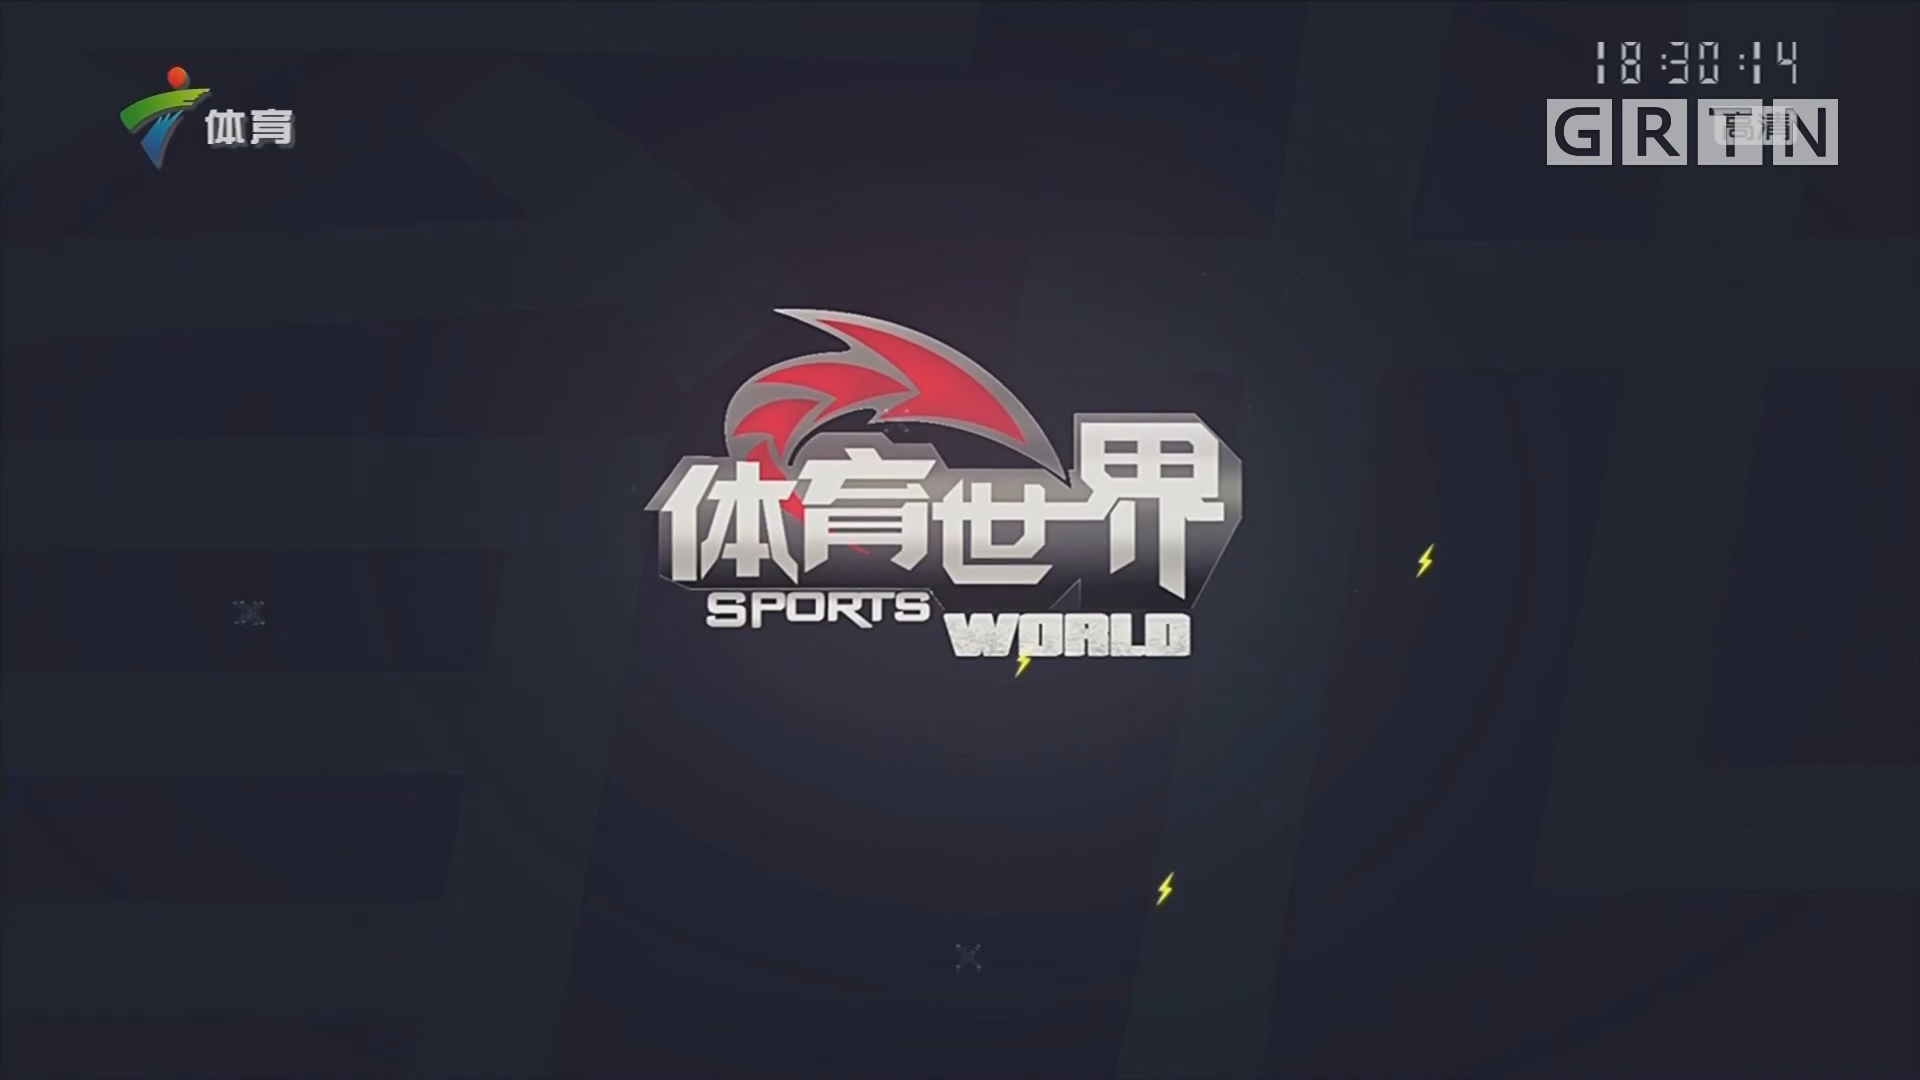 [HD][2019-01-09]体育世界:达喀尔拉力赛第二赛段 勒布夺得个人第11个赛段冠军